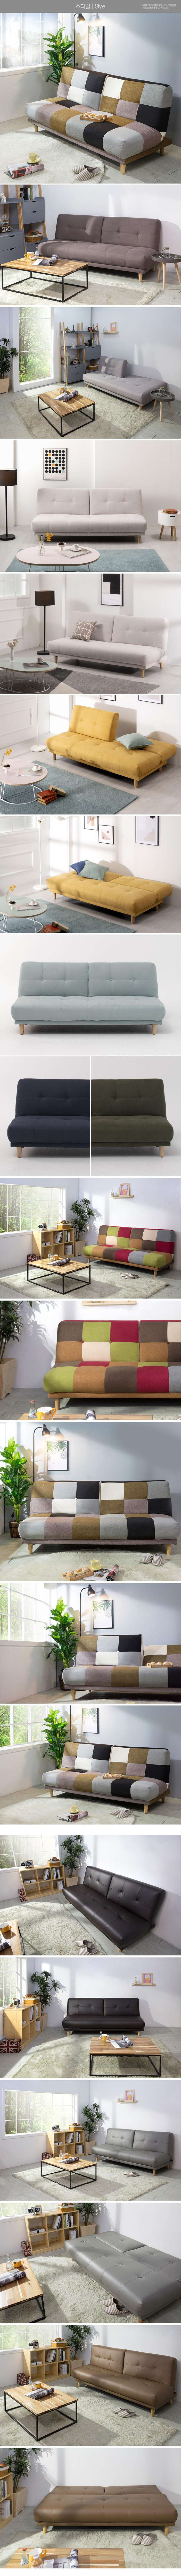 interior_sofabed.jpg